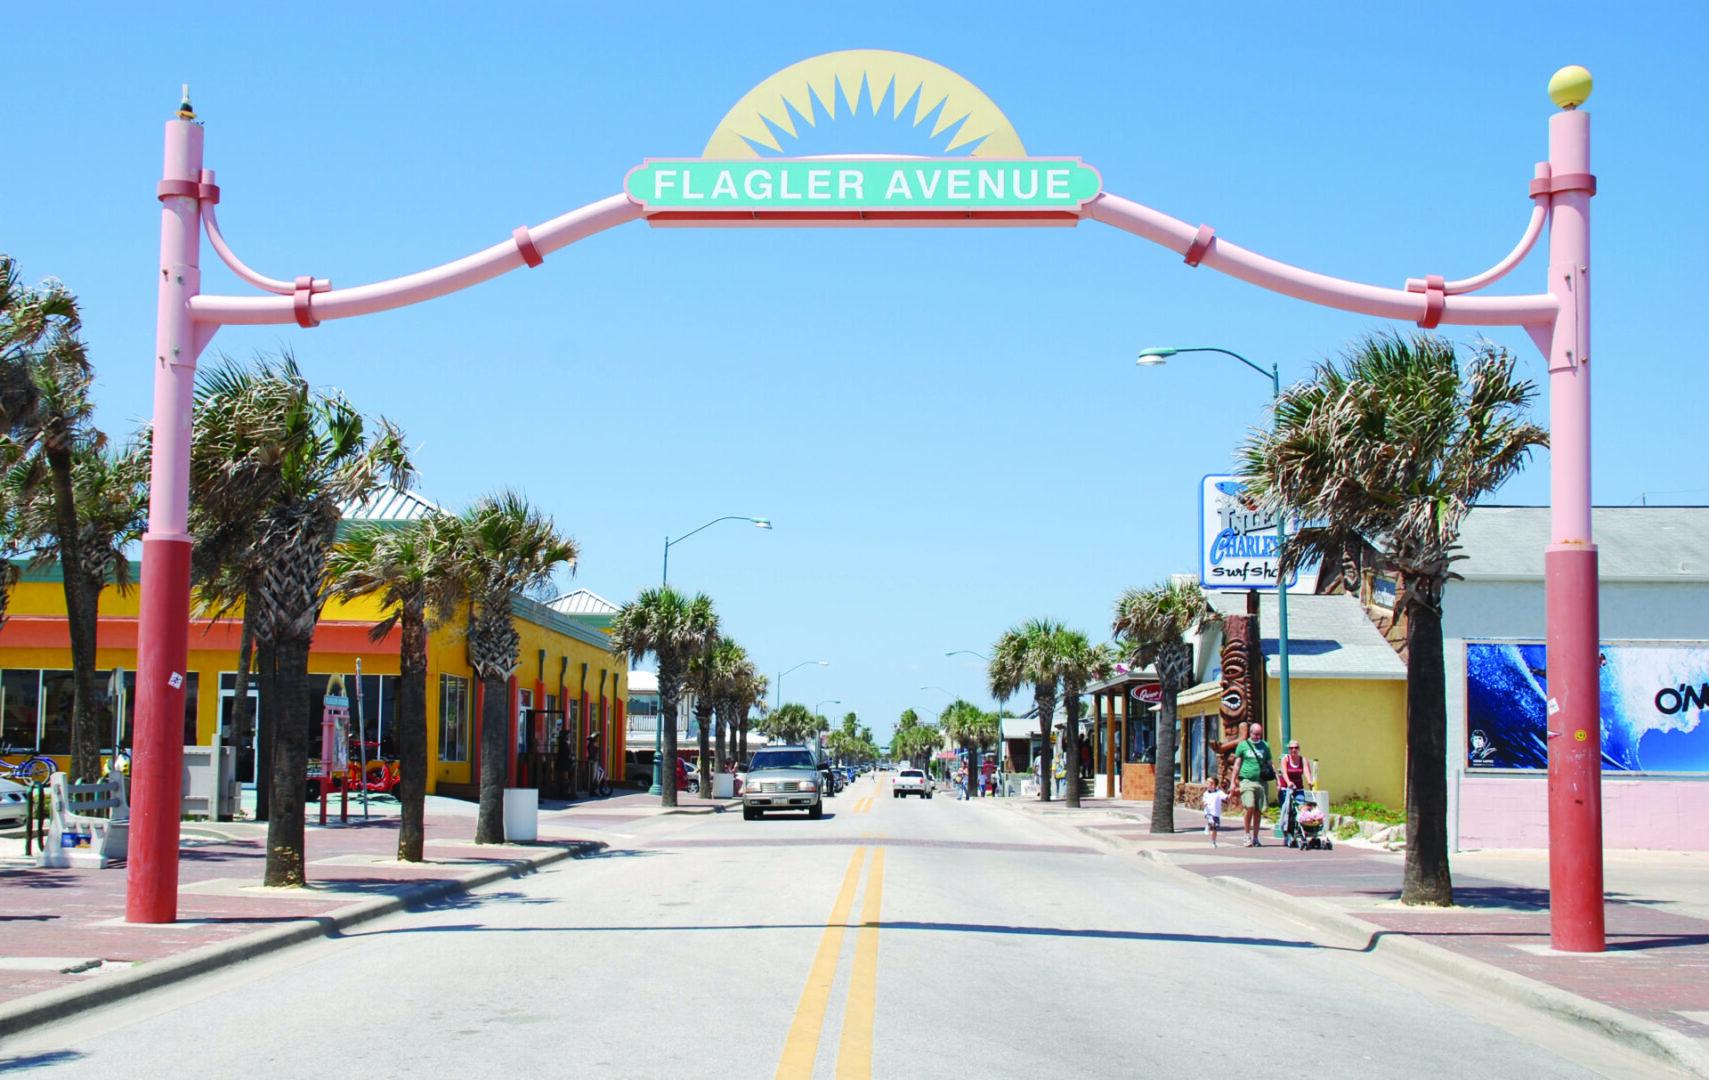 (102616 New Smyrna Beach, FL) Flalgler Avenue in New Smyrna Beach, FL. Photo courtesy New Smyrna Beach Area Convention and Visitors Bureau